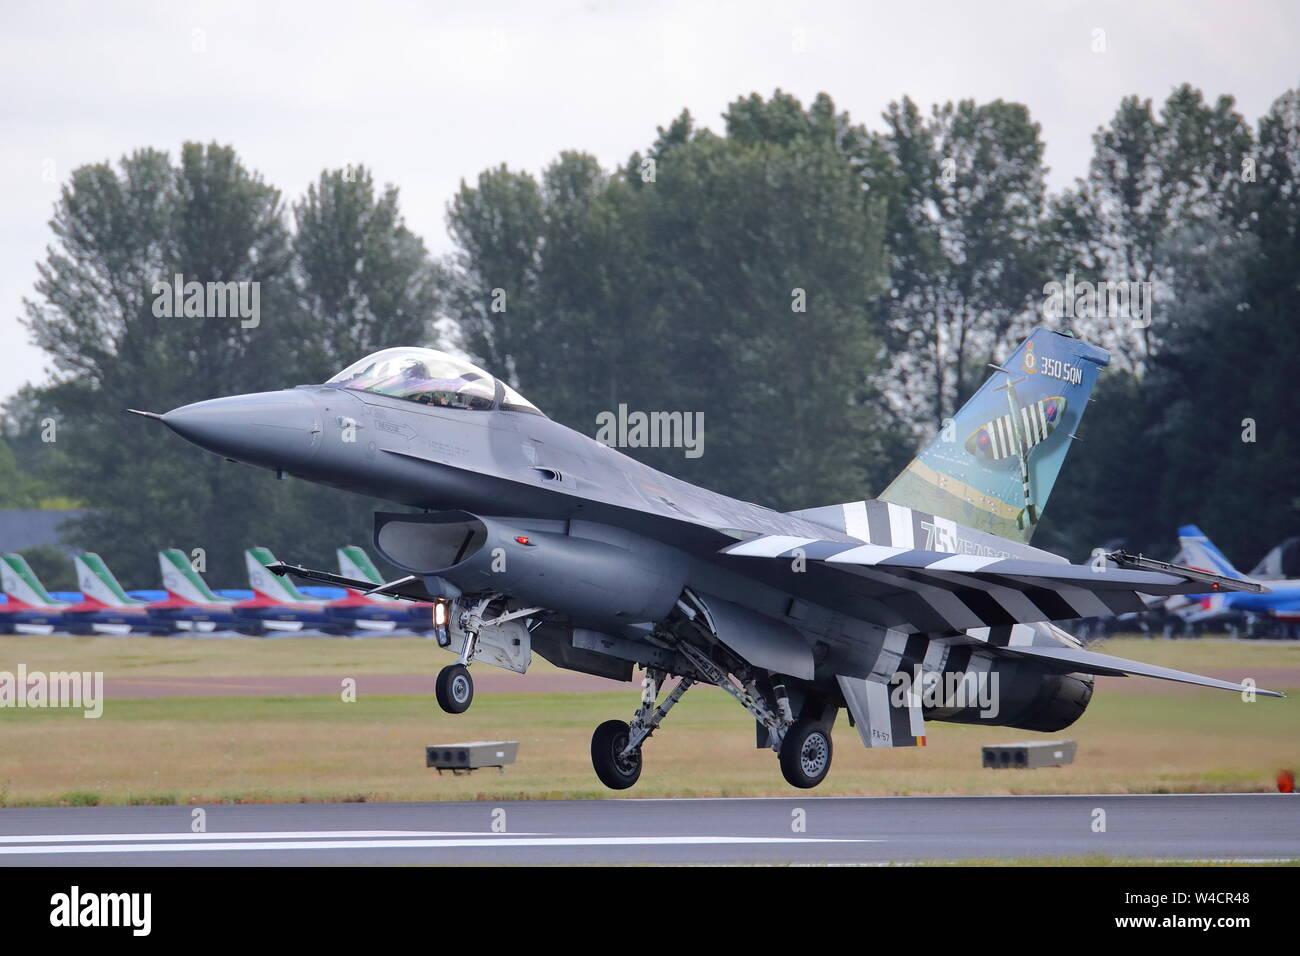 General Dynamics F-16 belge en couleurs D-Day landing au Royal International Air Tattoo à Fairford RIAT 2019 RAF, Gloucestershire, Royaume-Uni Banque D'Images